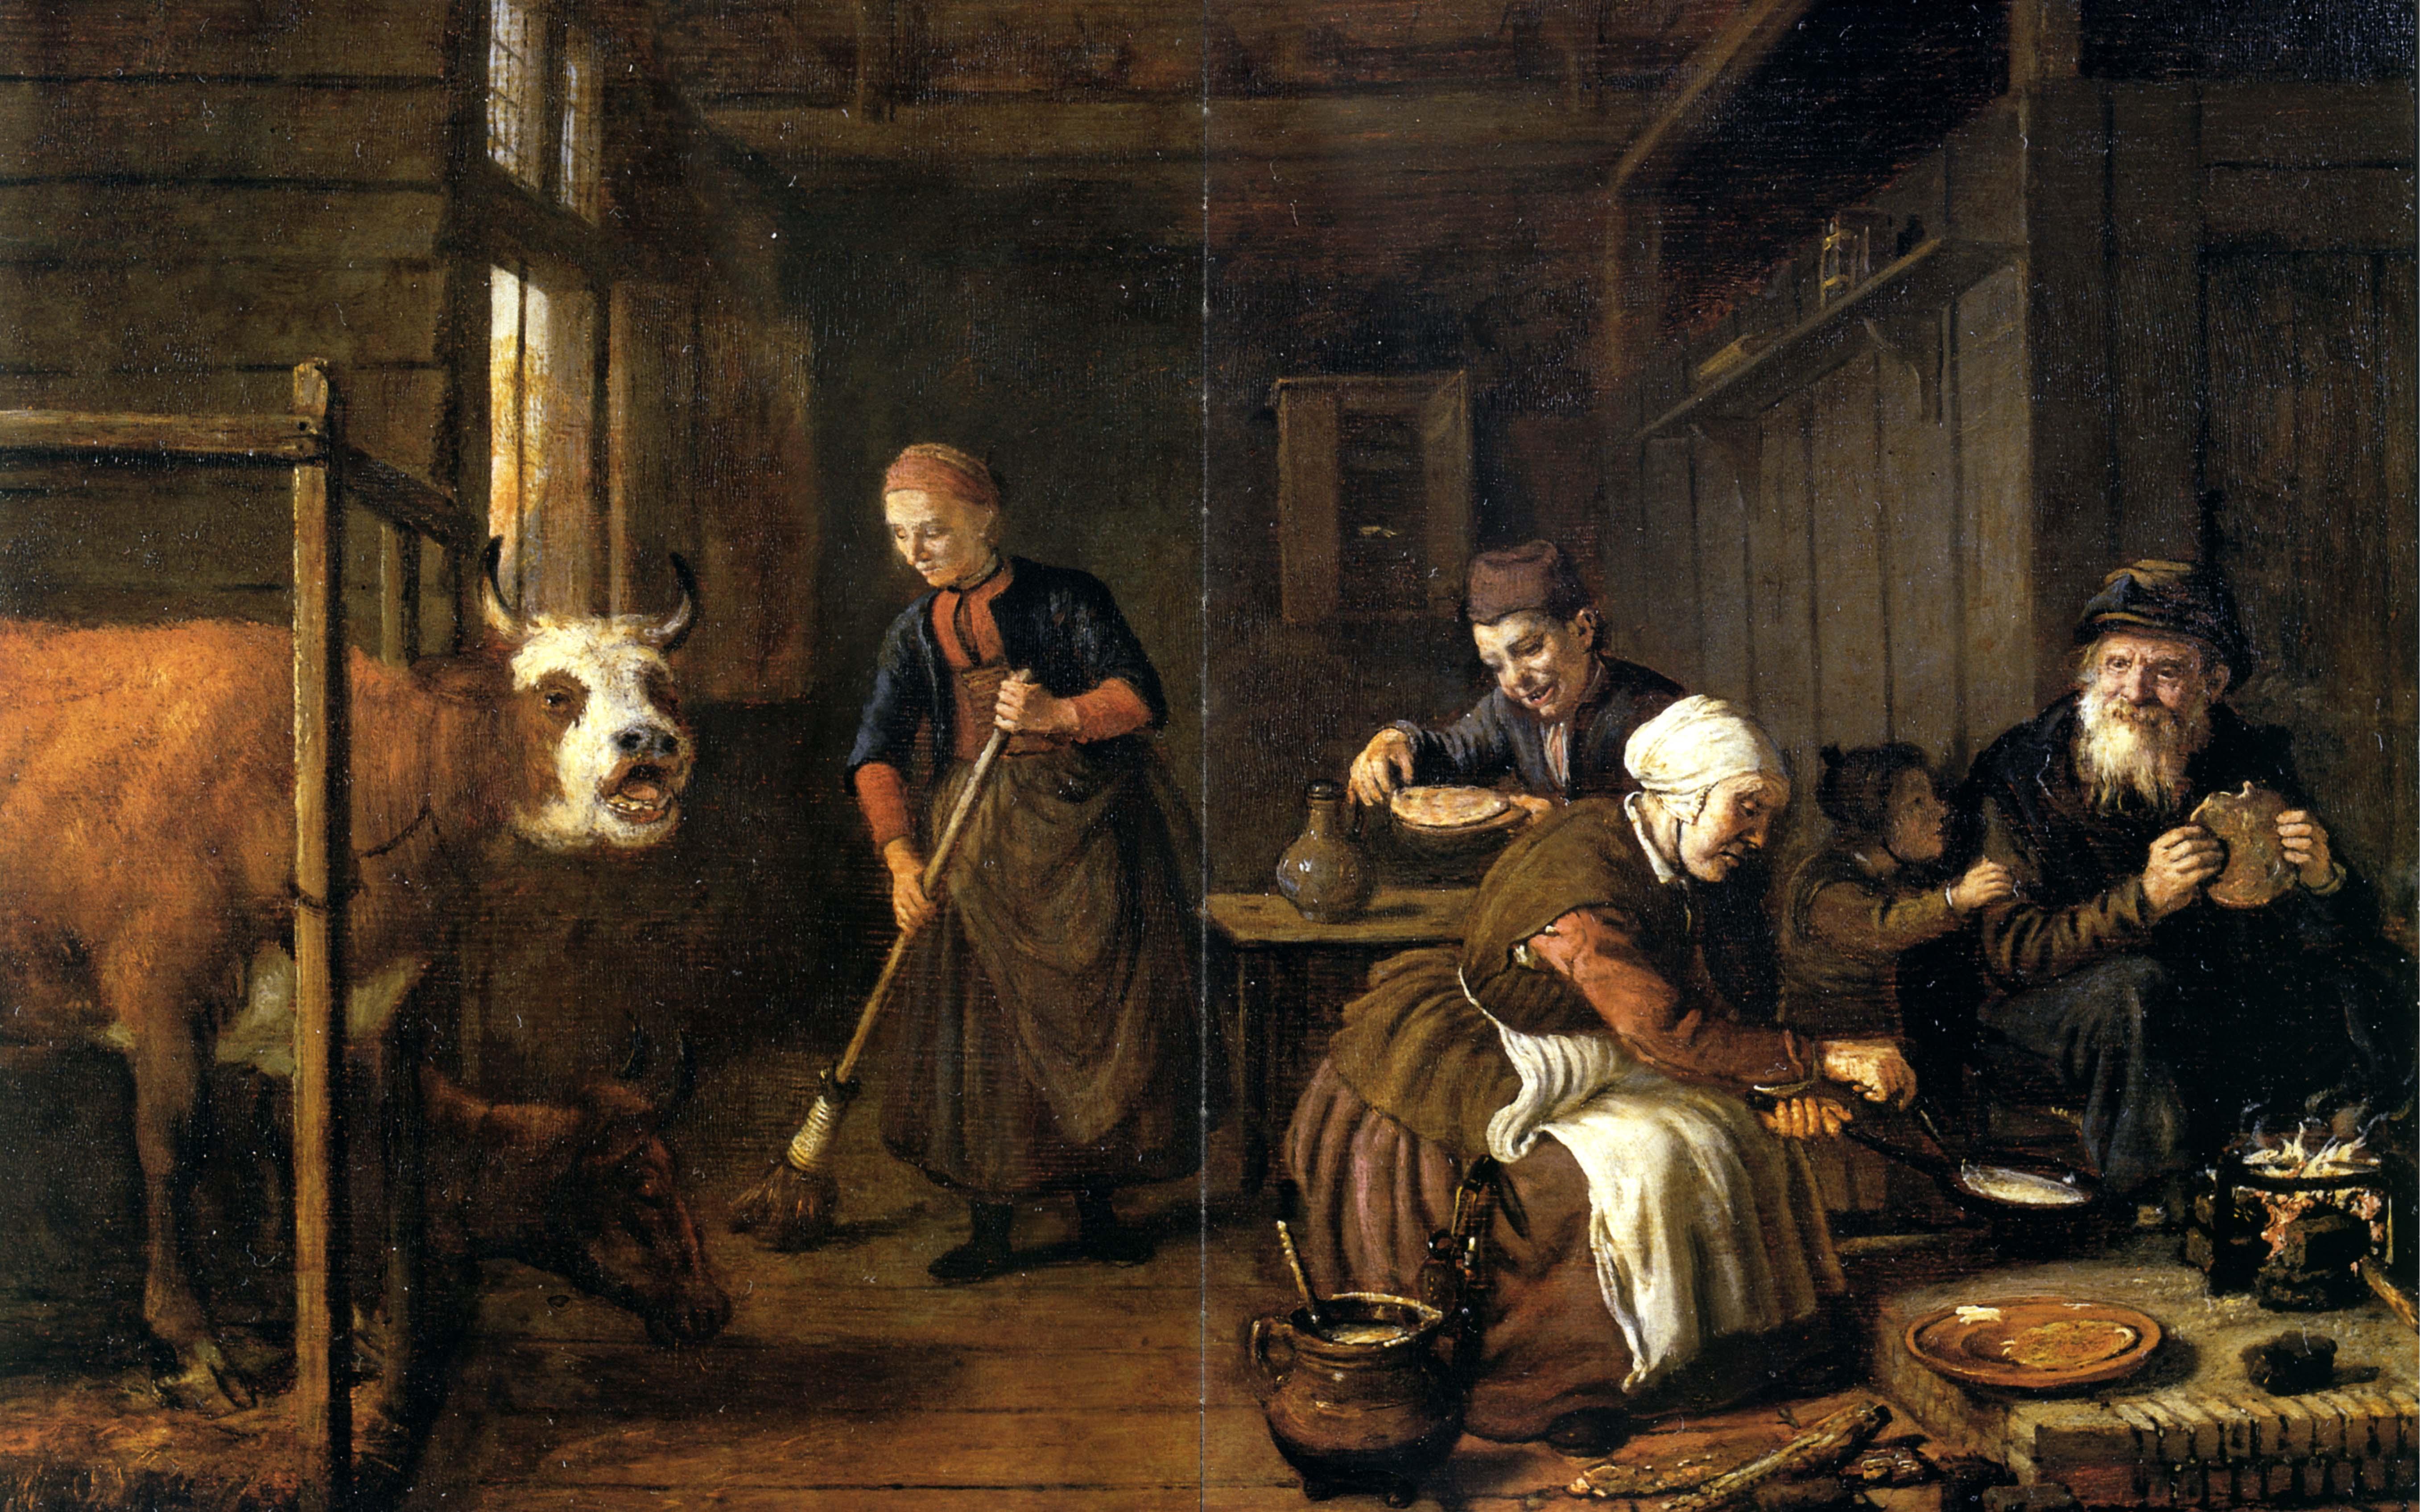 Animaux on pinterest for Horemans interieur